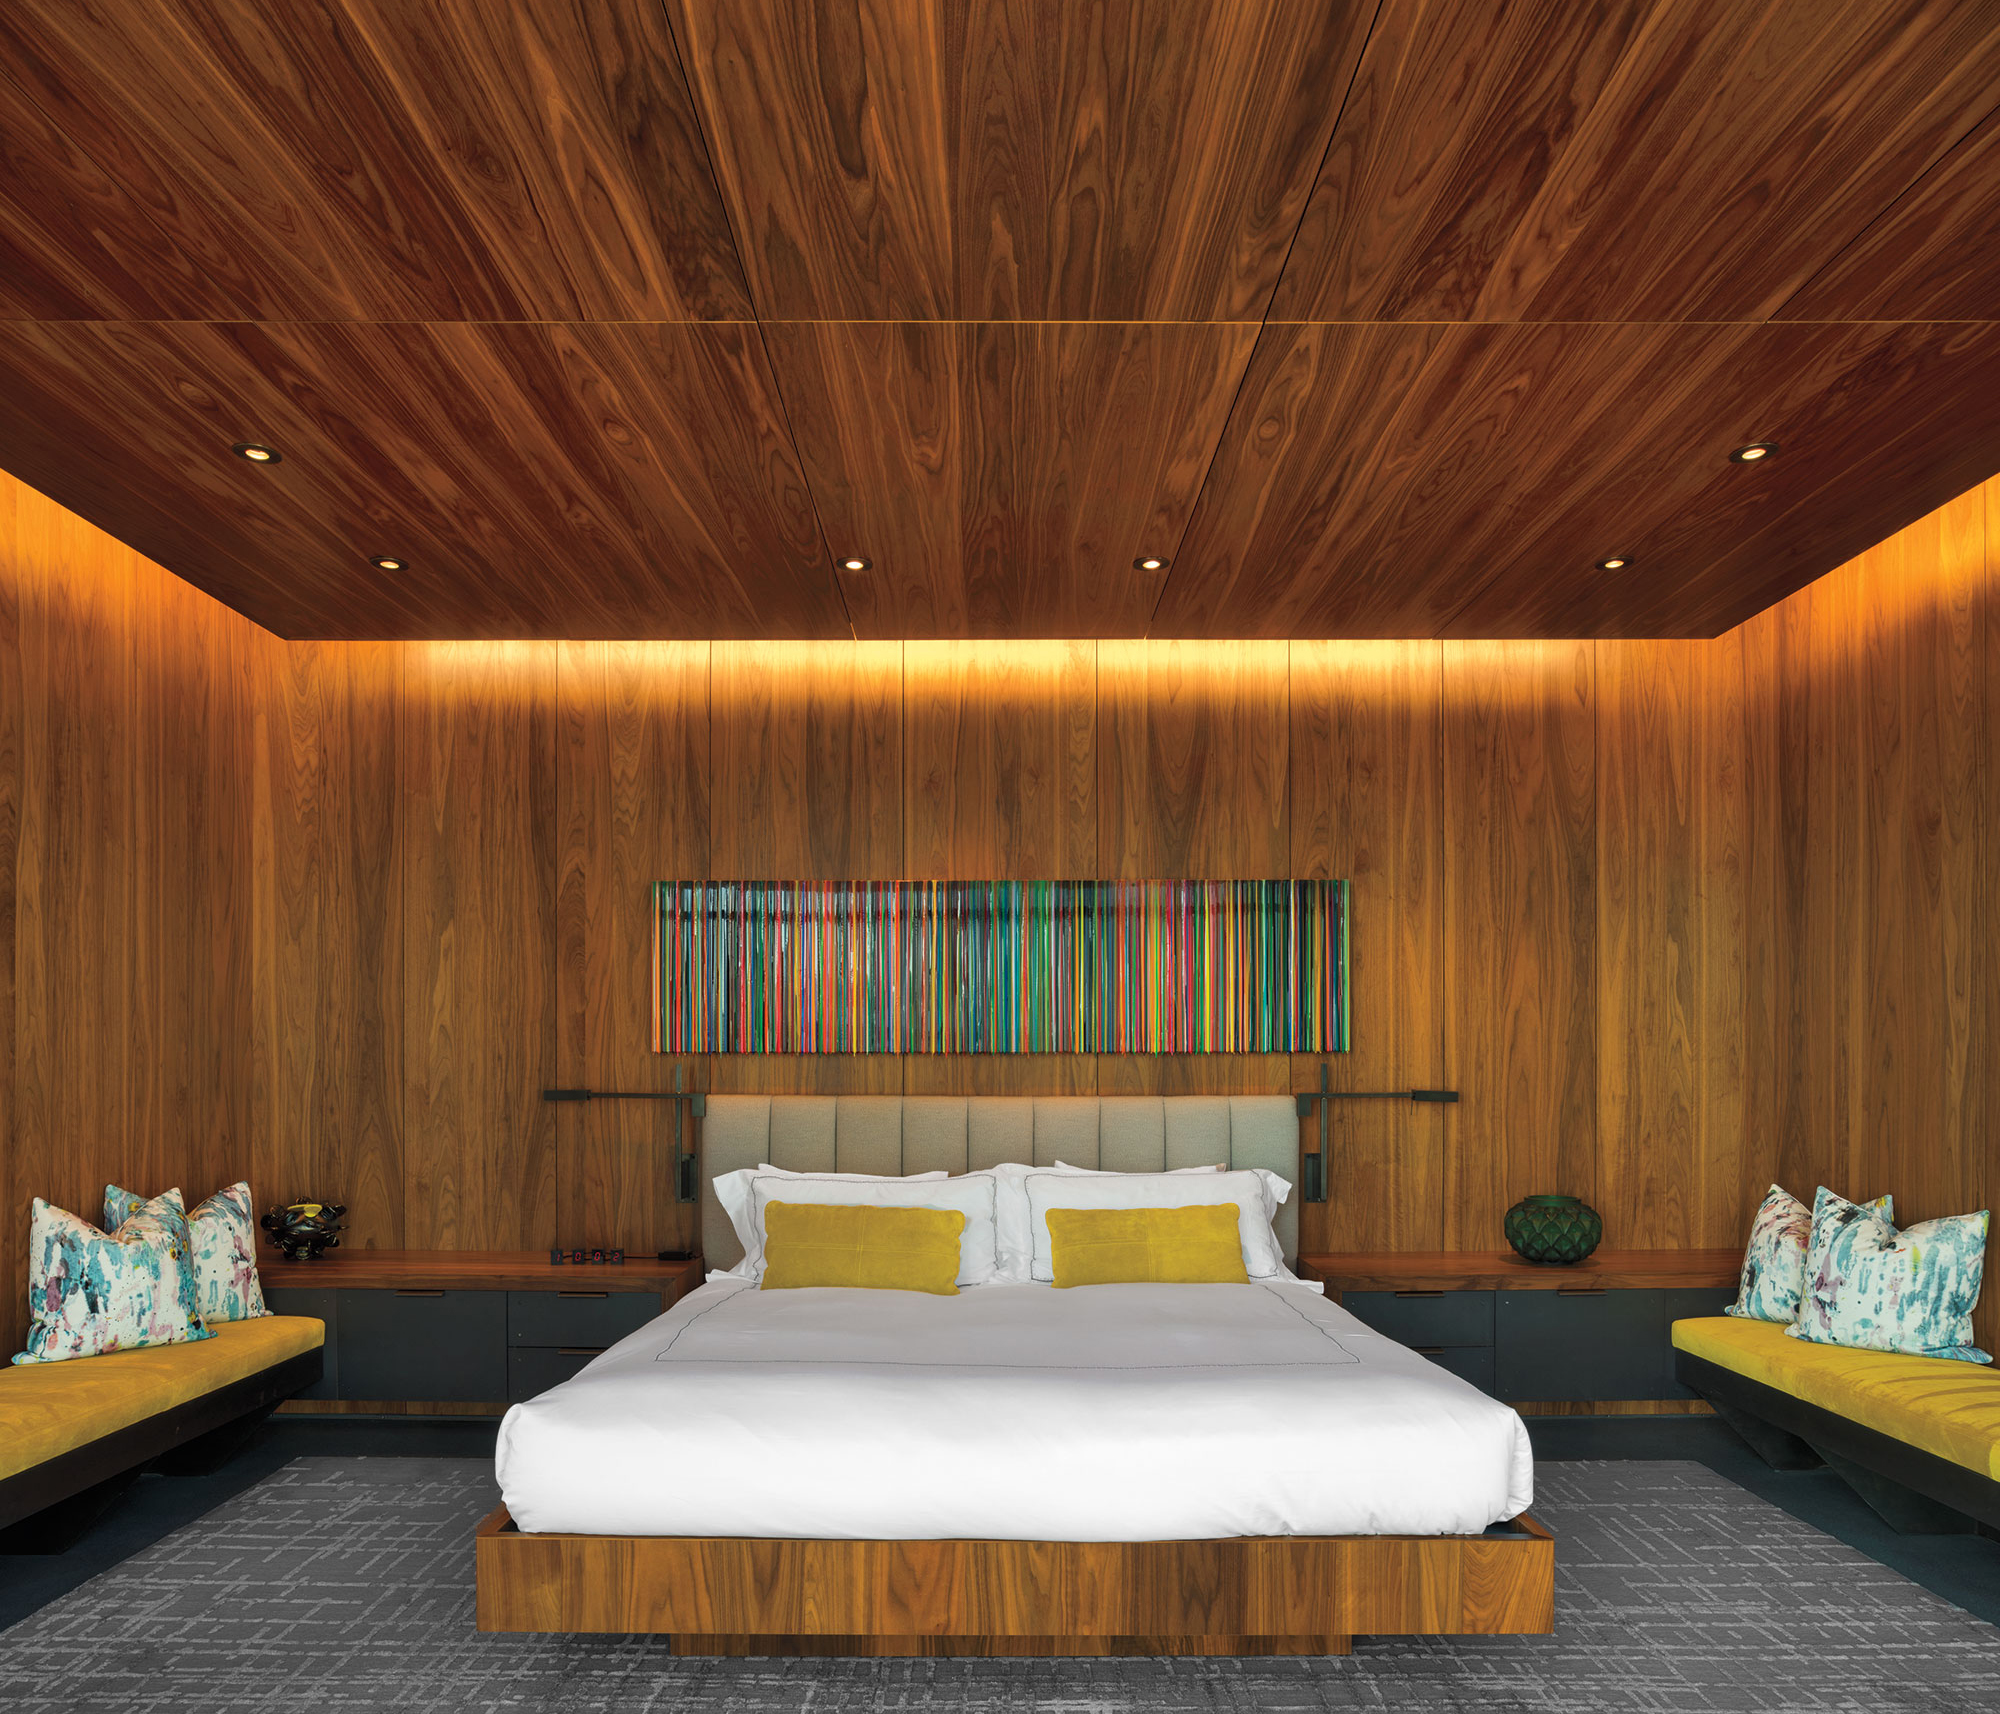 . 15 Dreamy Bedrooms